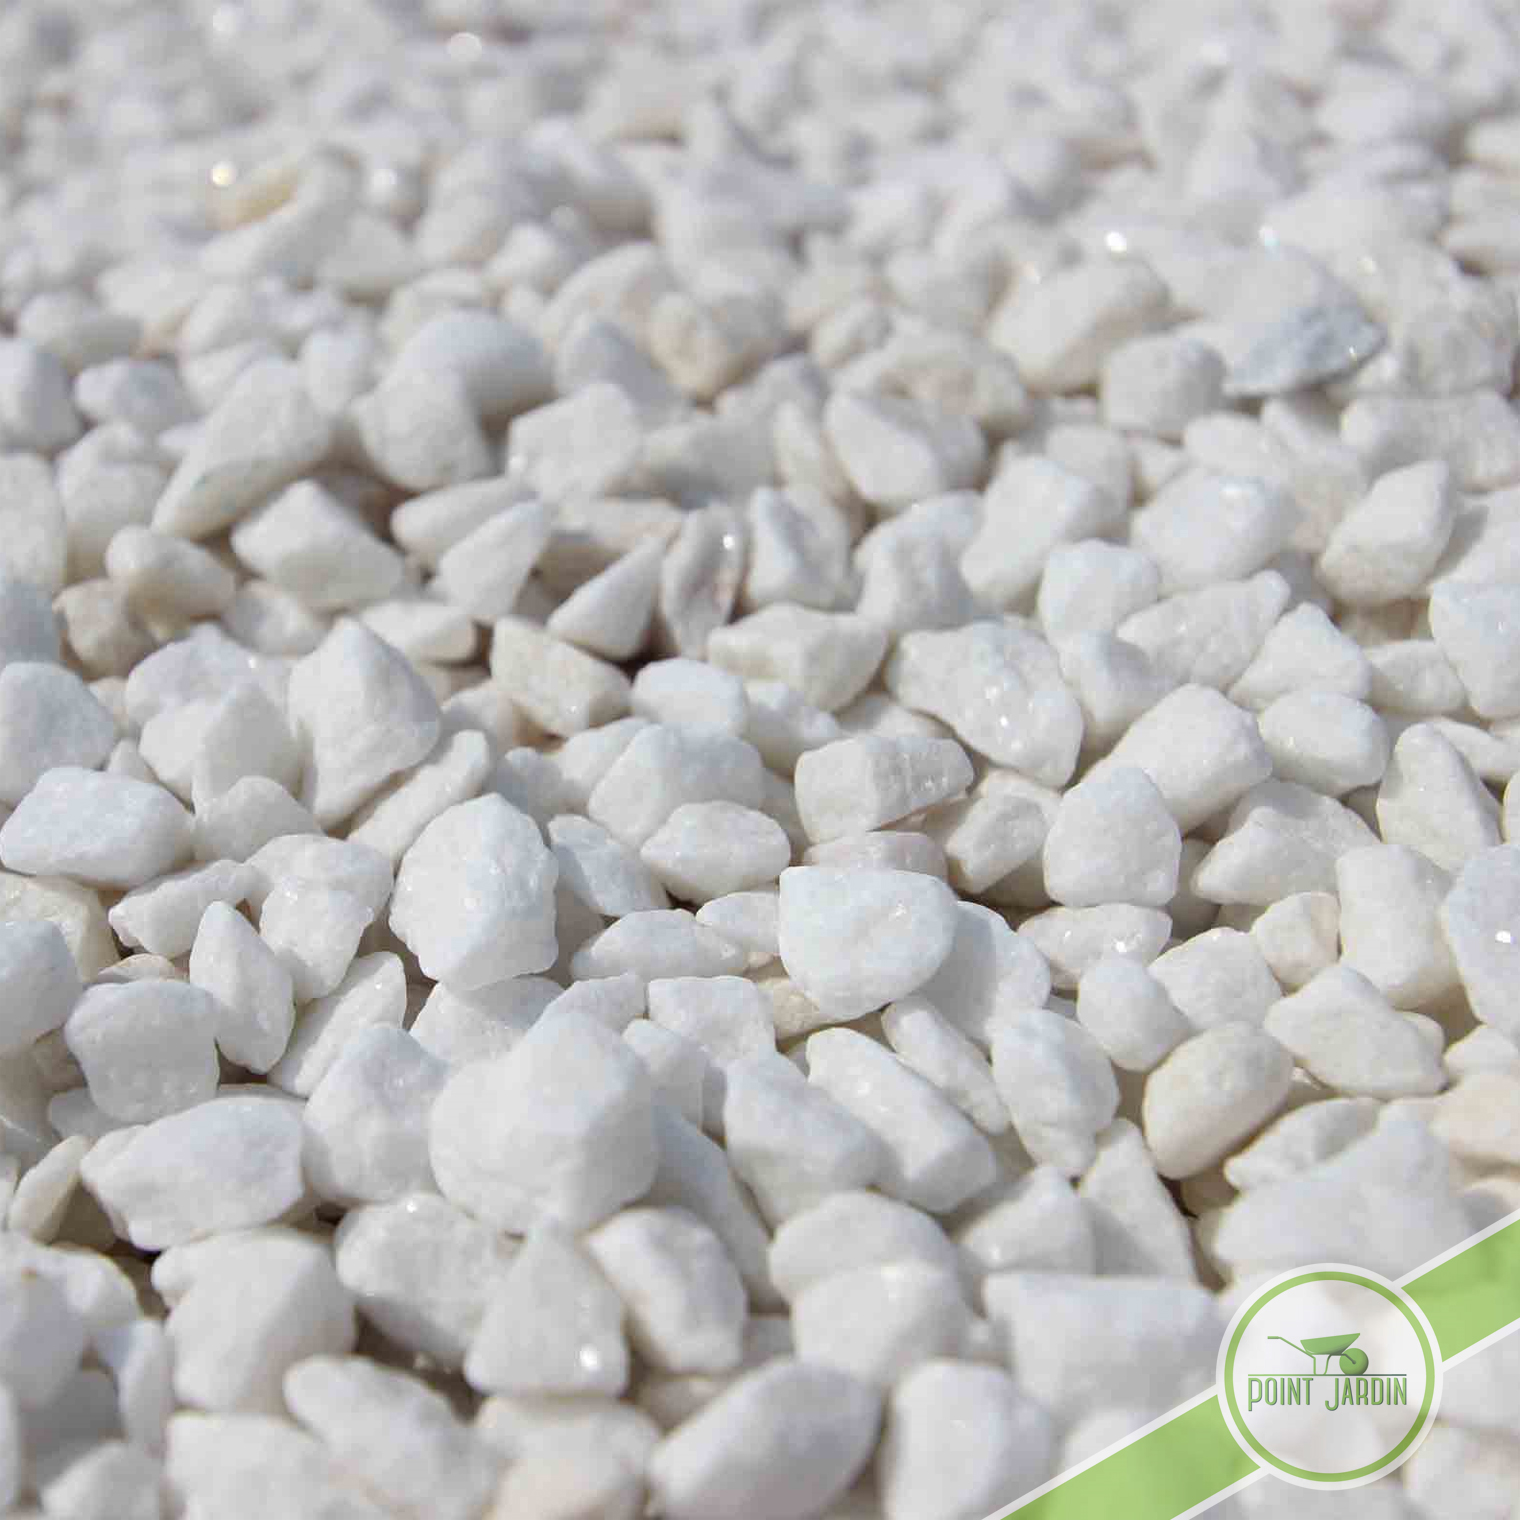 Jardin gravier blanc gravier blanc marbre dreux houdan for Gravier en marbre blanc